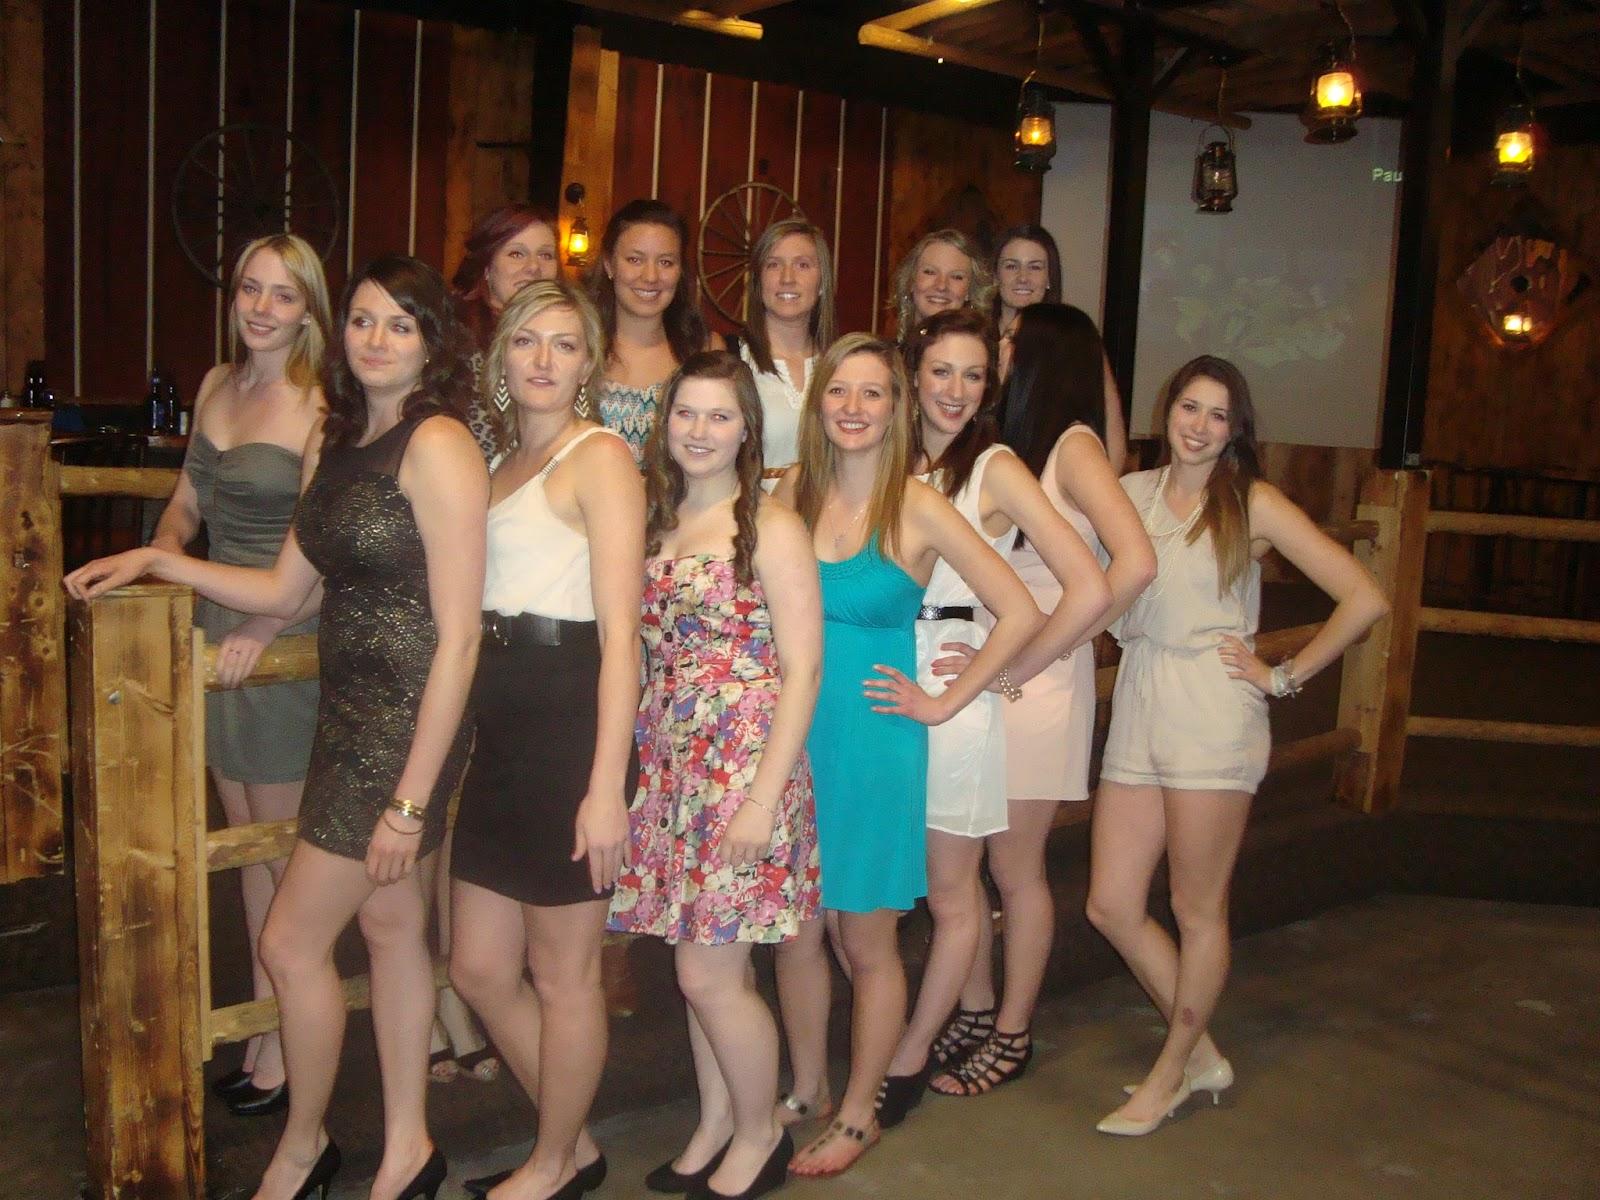 Semi Formal Dresses for Banquet